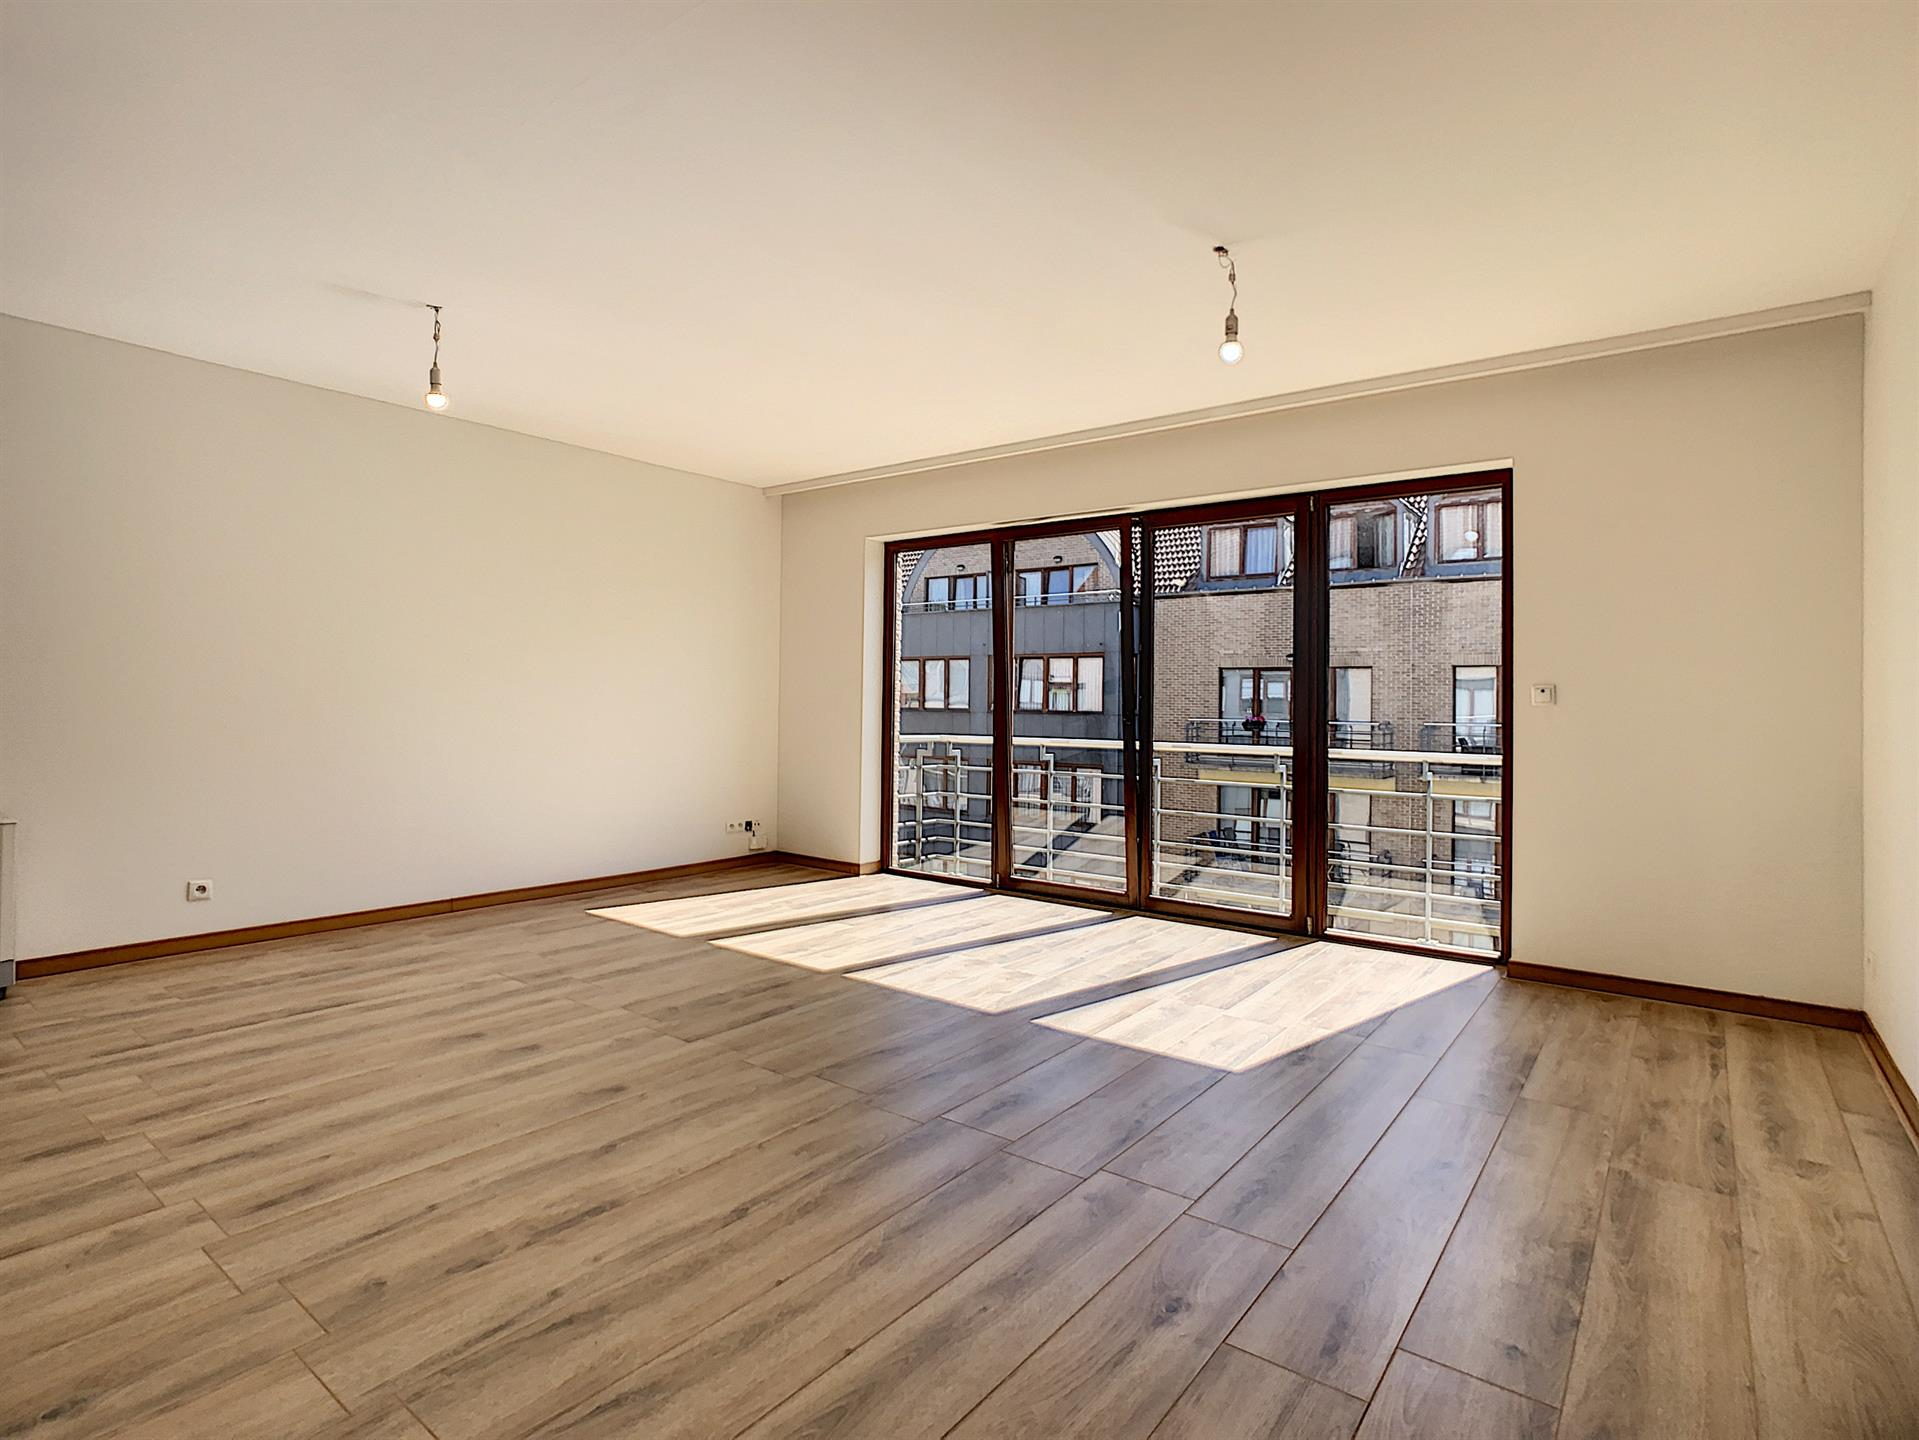 Appartement - Anderlecht - #4527922-1